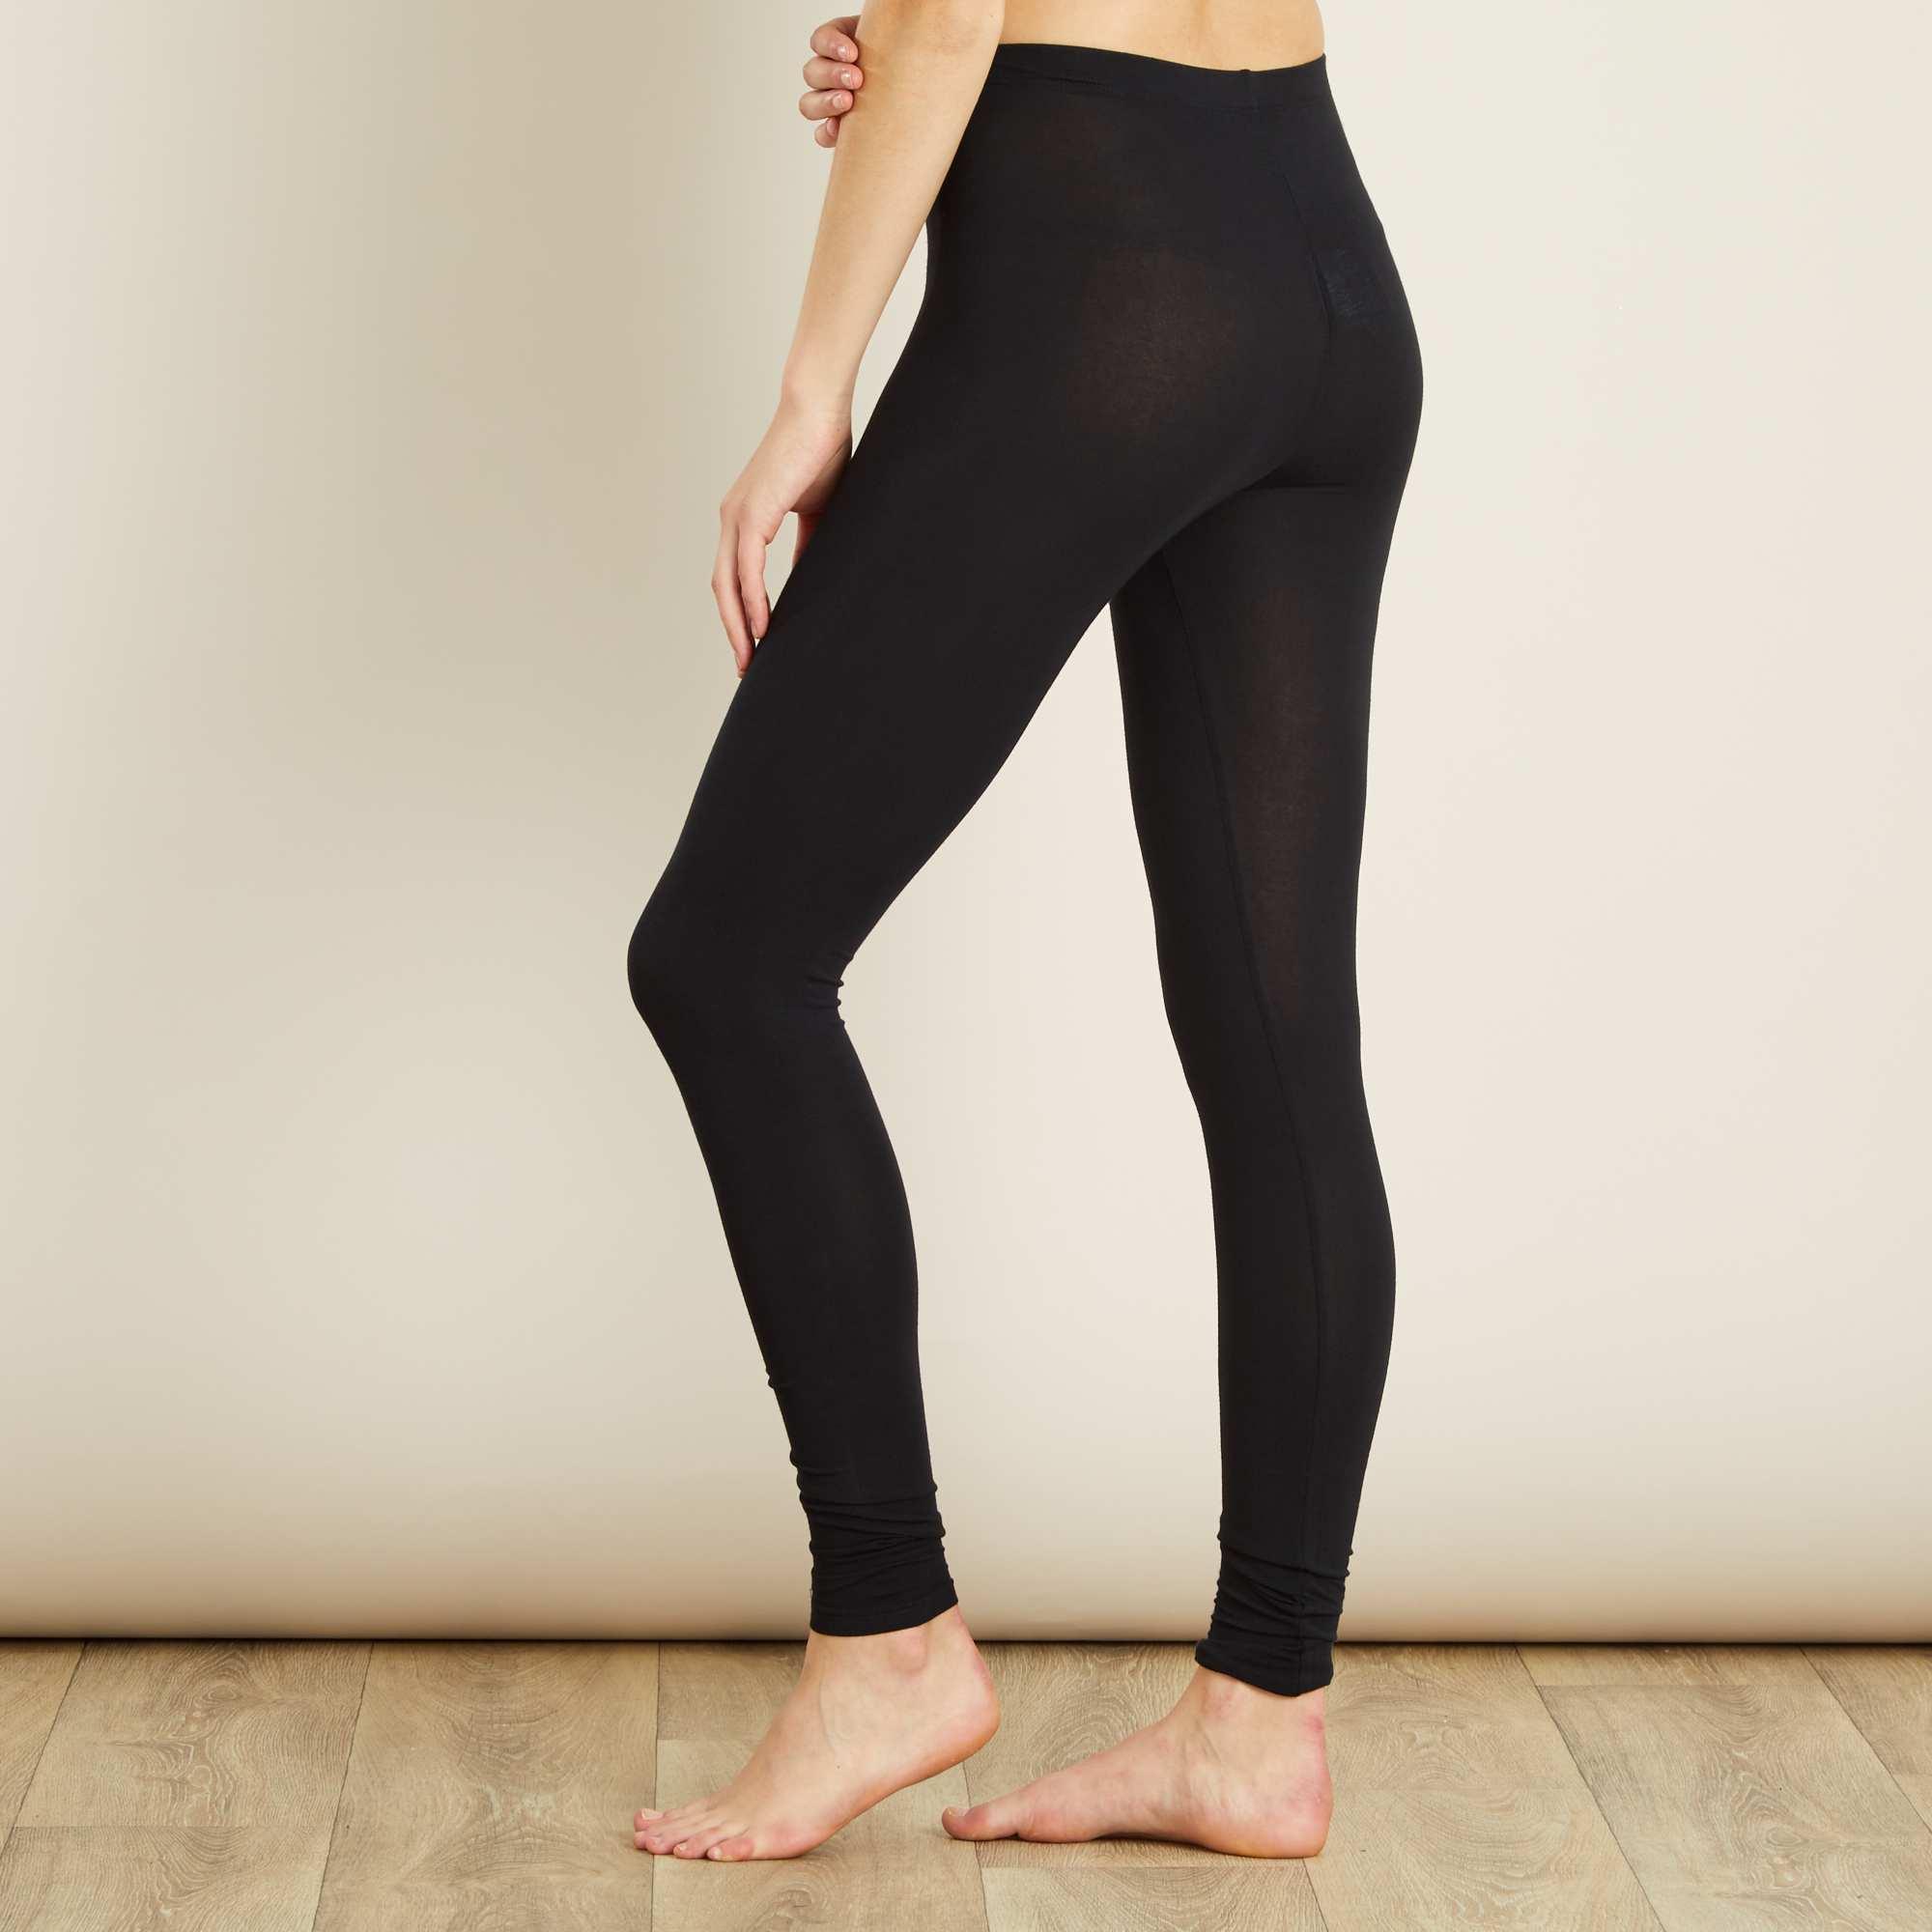 newest collection 95f15 4e395 legging-long-stretch-noir-femme-dx534 3 zc1.jpg